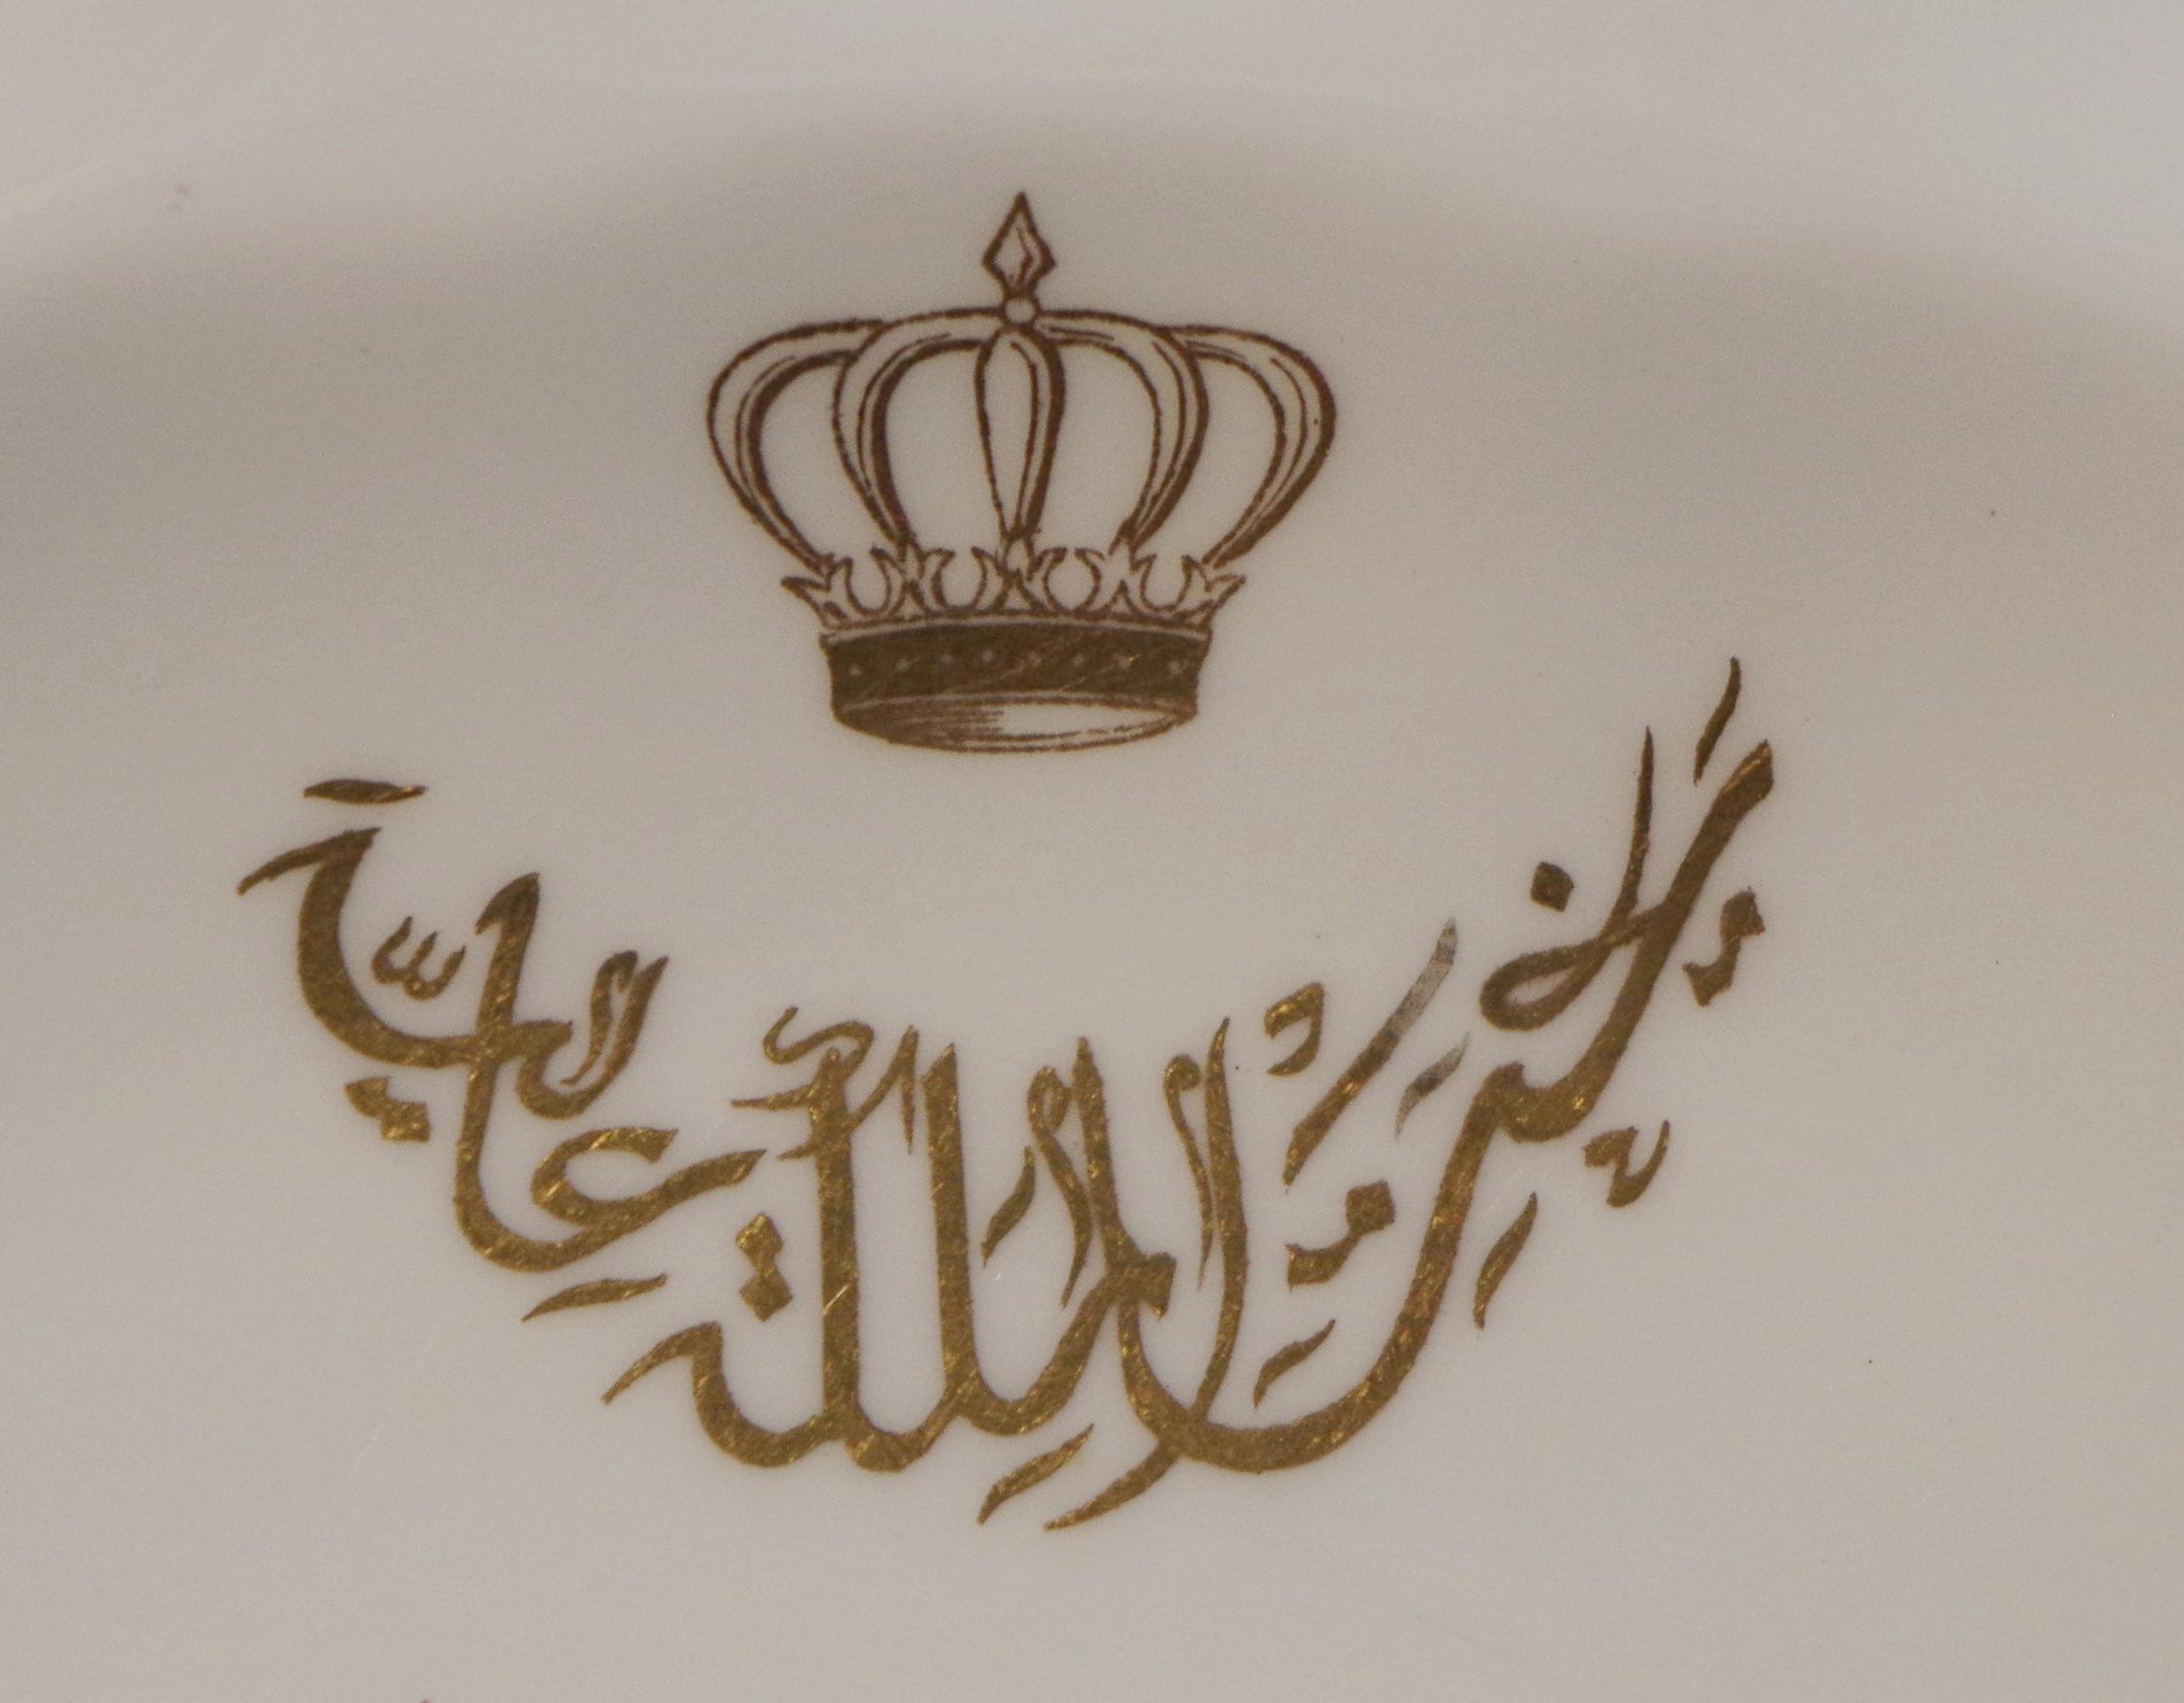 royal-crown-derby-king-faisal-II-iraq-royal-pinxton-roses-crest-close-up